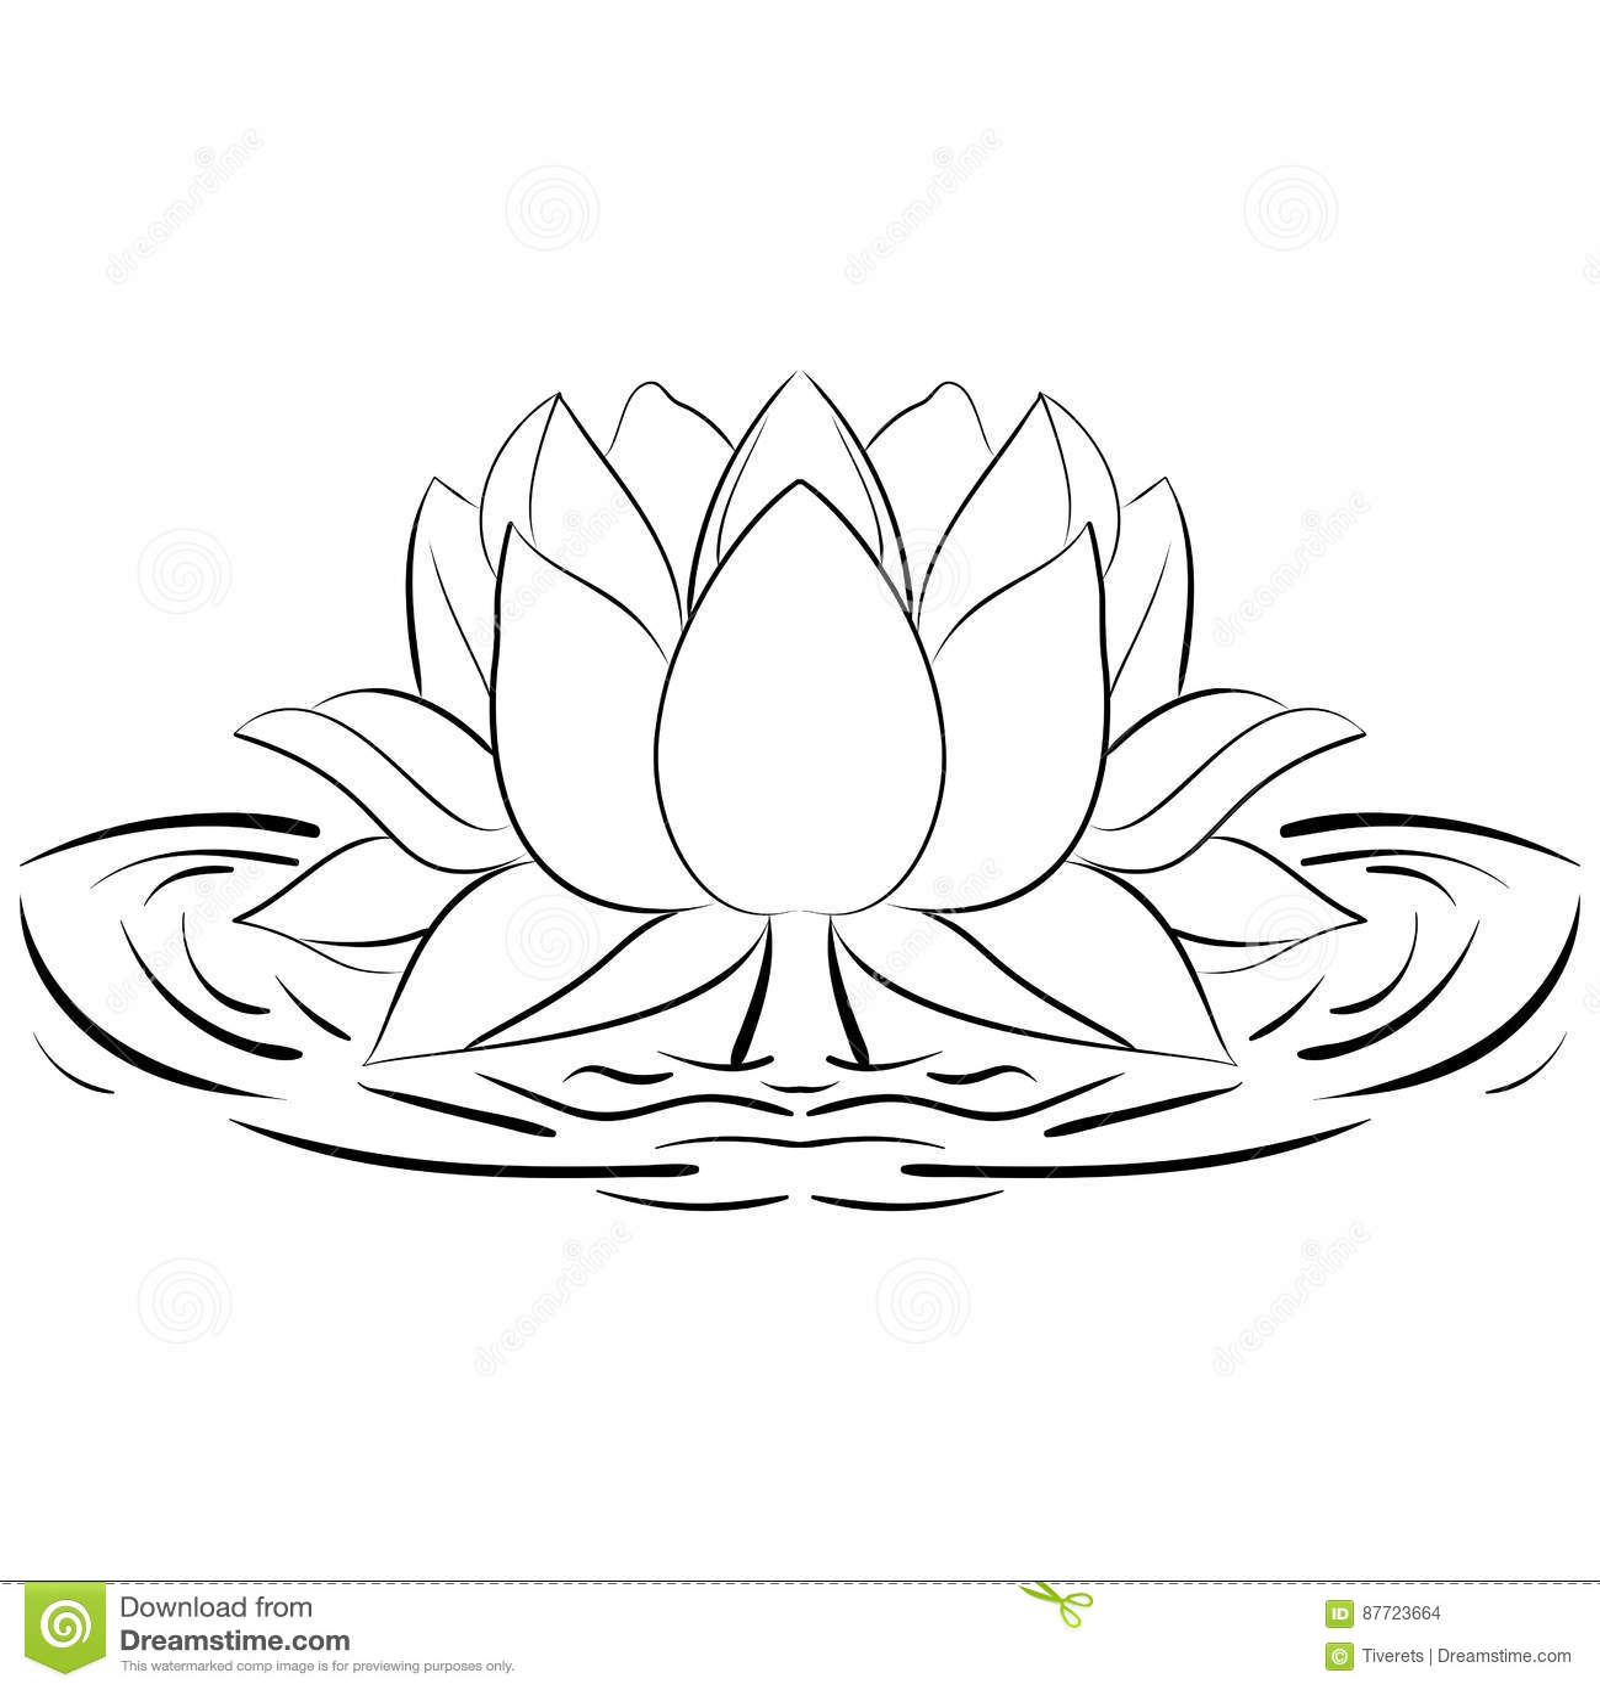 Lotus Sketch Flower Design Elements Illustration Stock Vector